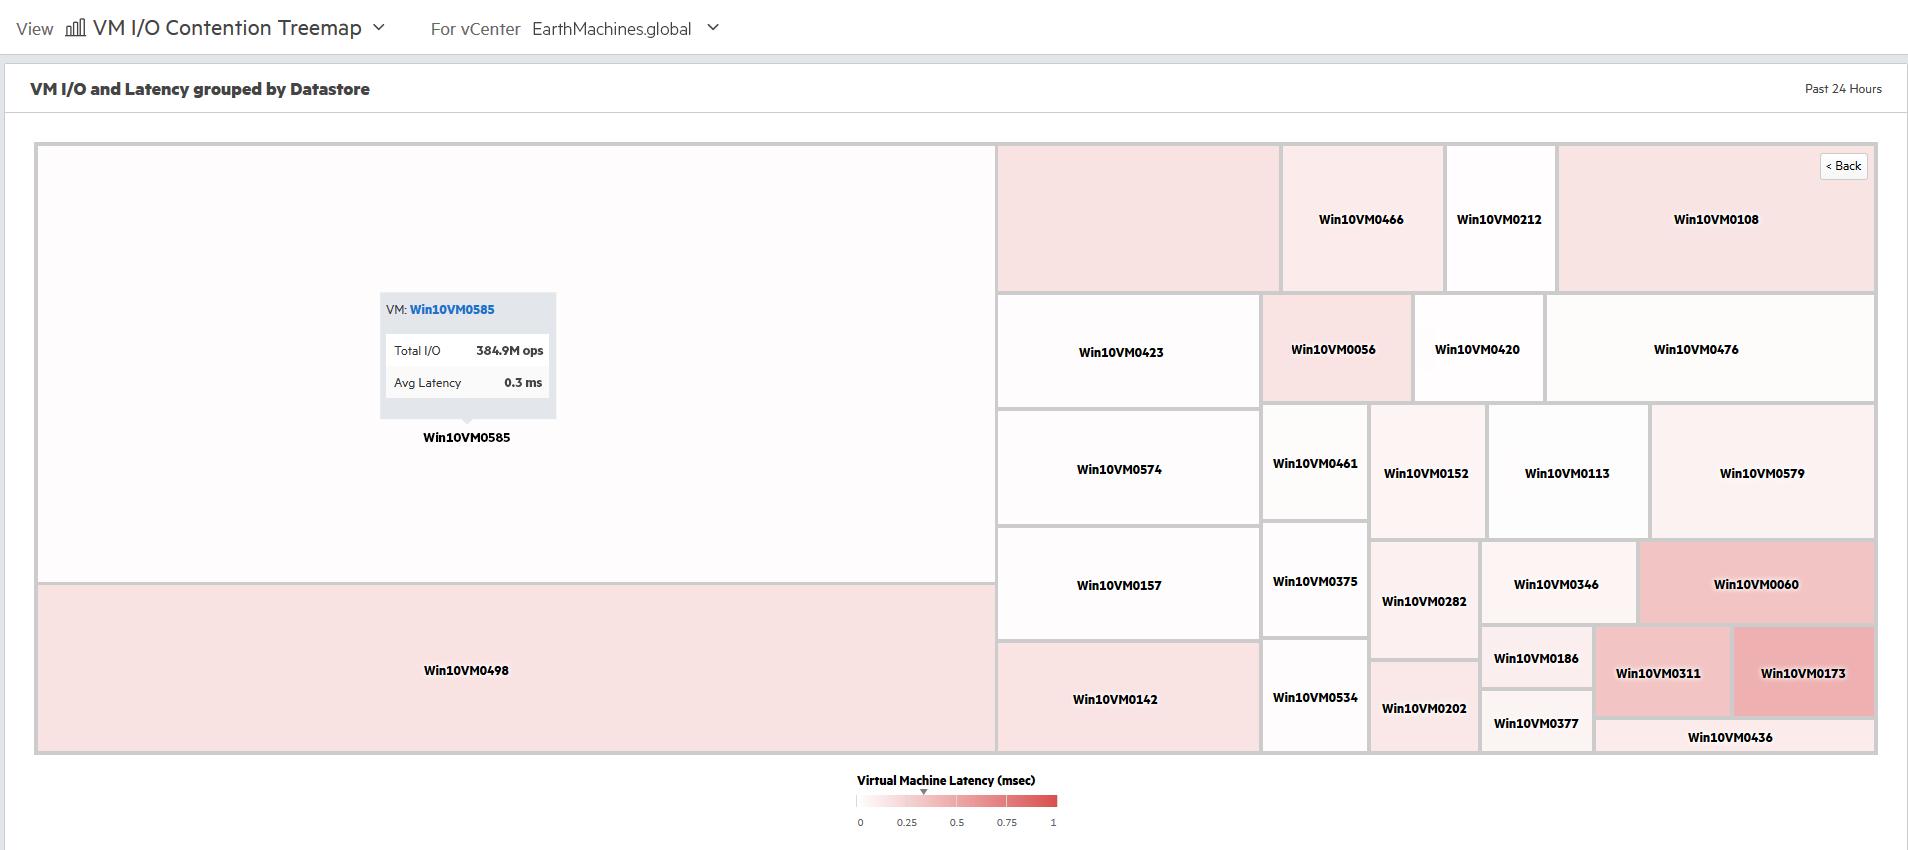 SectionA_InfoSight_ScreenShot1_HeatMap_Rev2.png